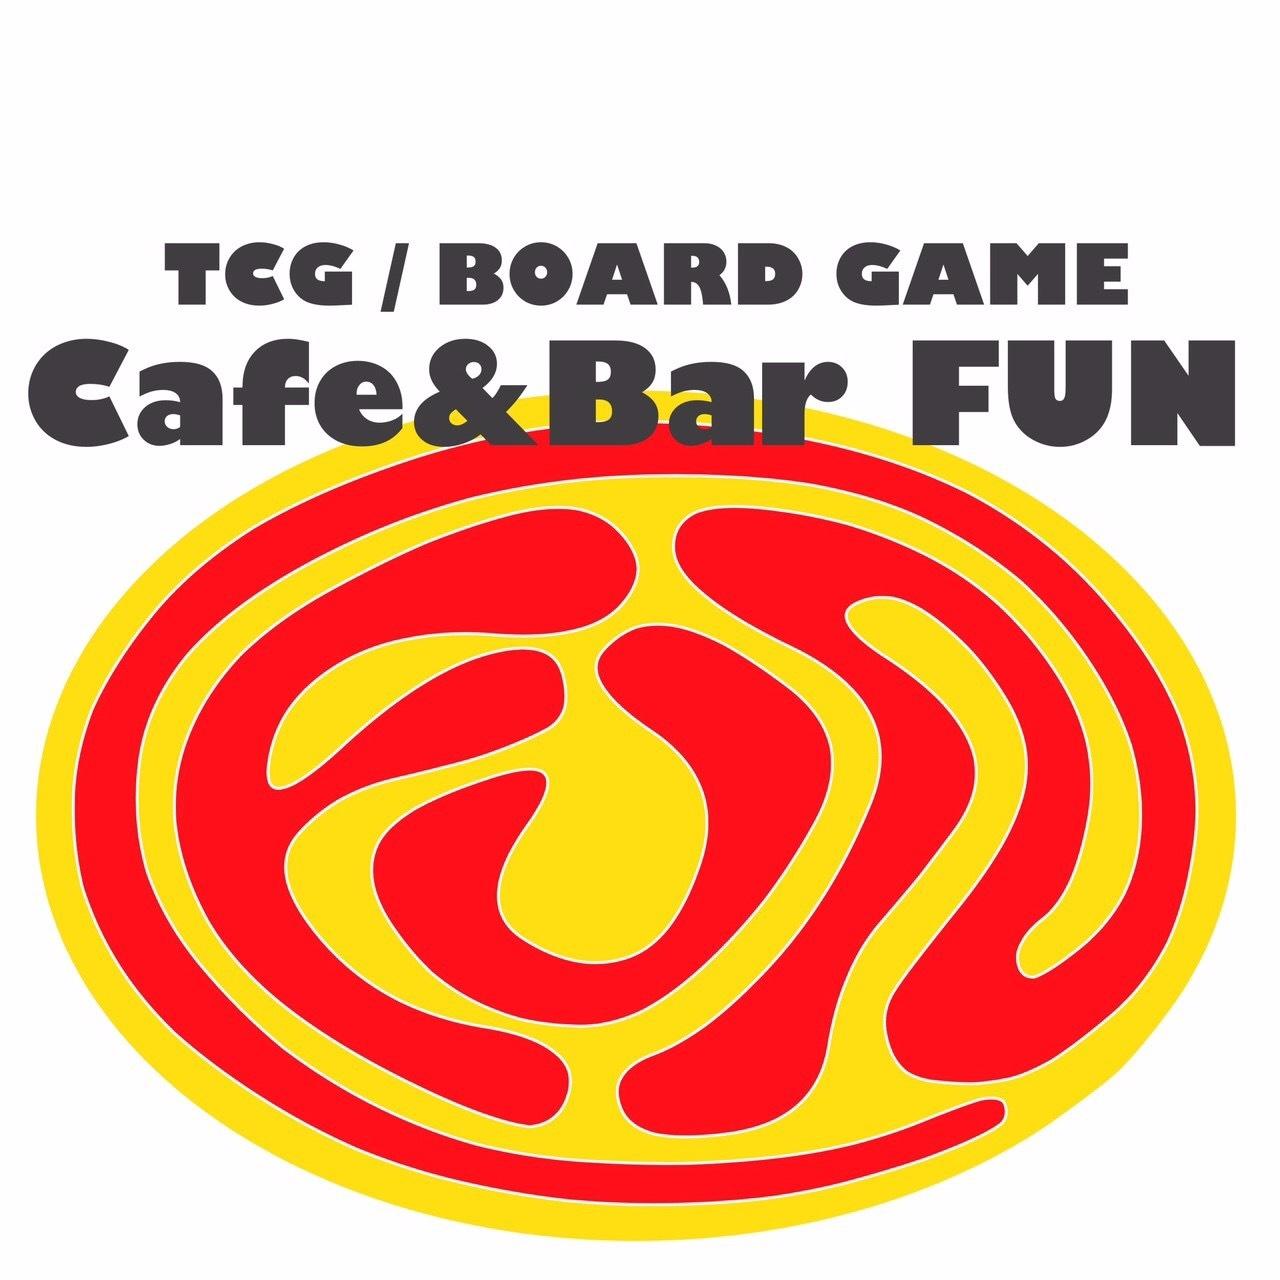 TCG/BOARD GAME Cafe & Bar FUN(ティーシージー ボードゲームカフェアンドバー ファン)